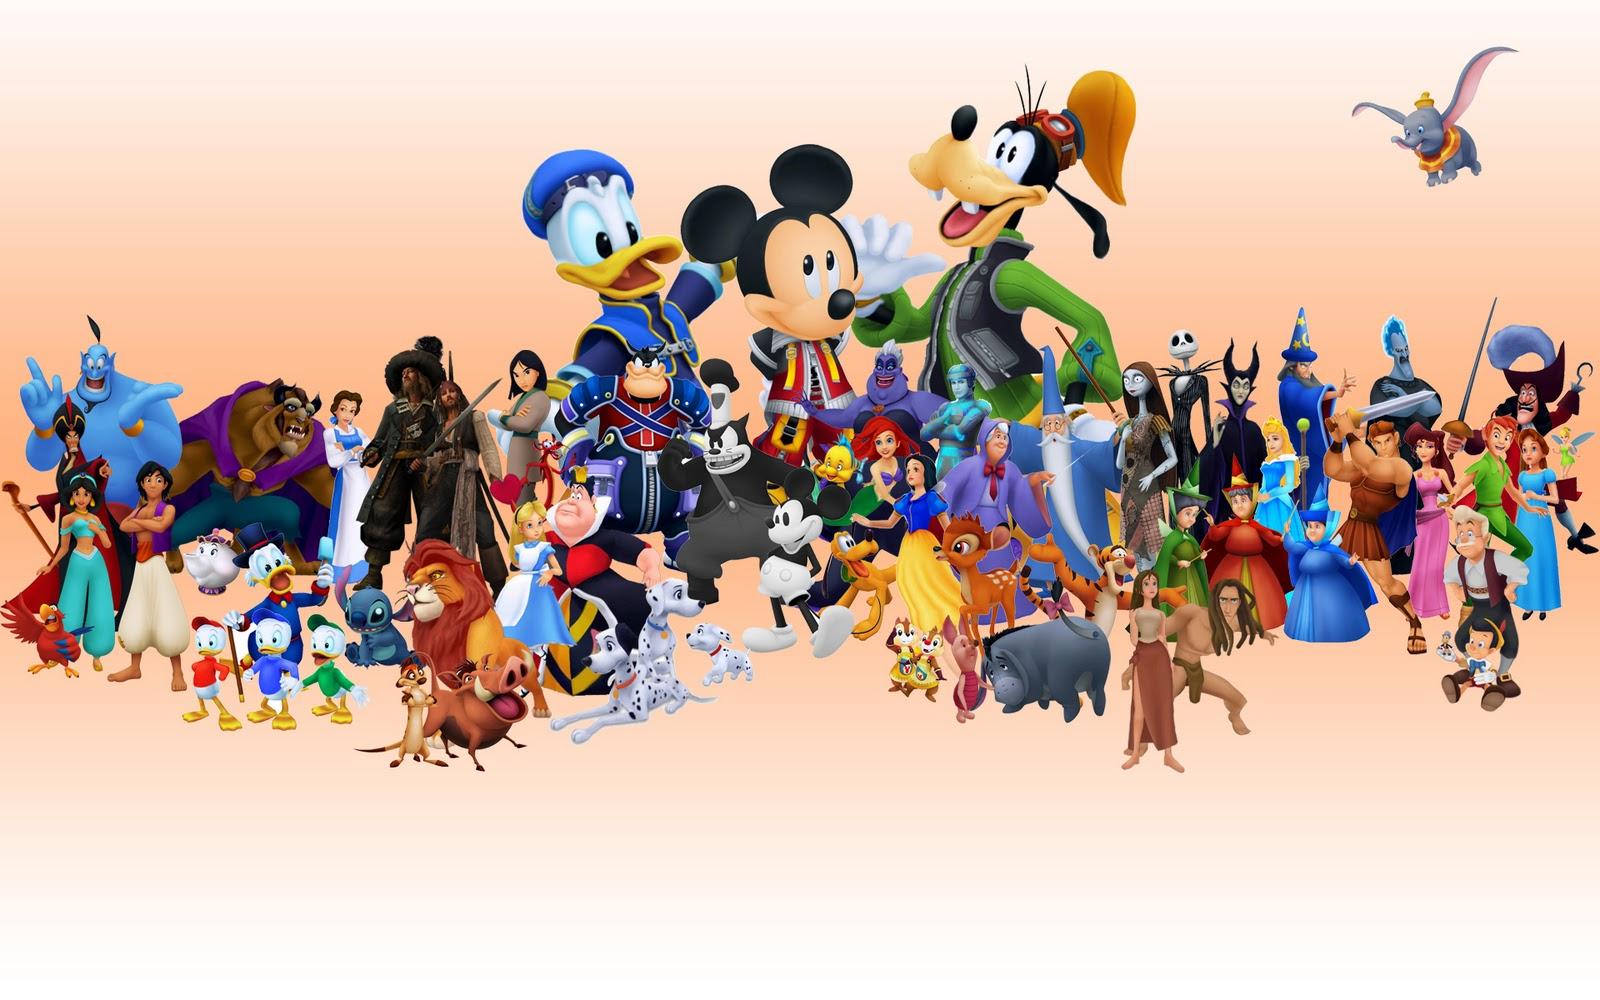 Main disney characters clipart clip art freeuse library Disney world characters clipart - ClipartFest clip art freeuse library